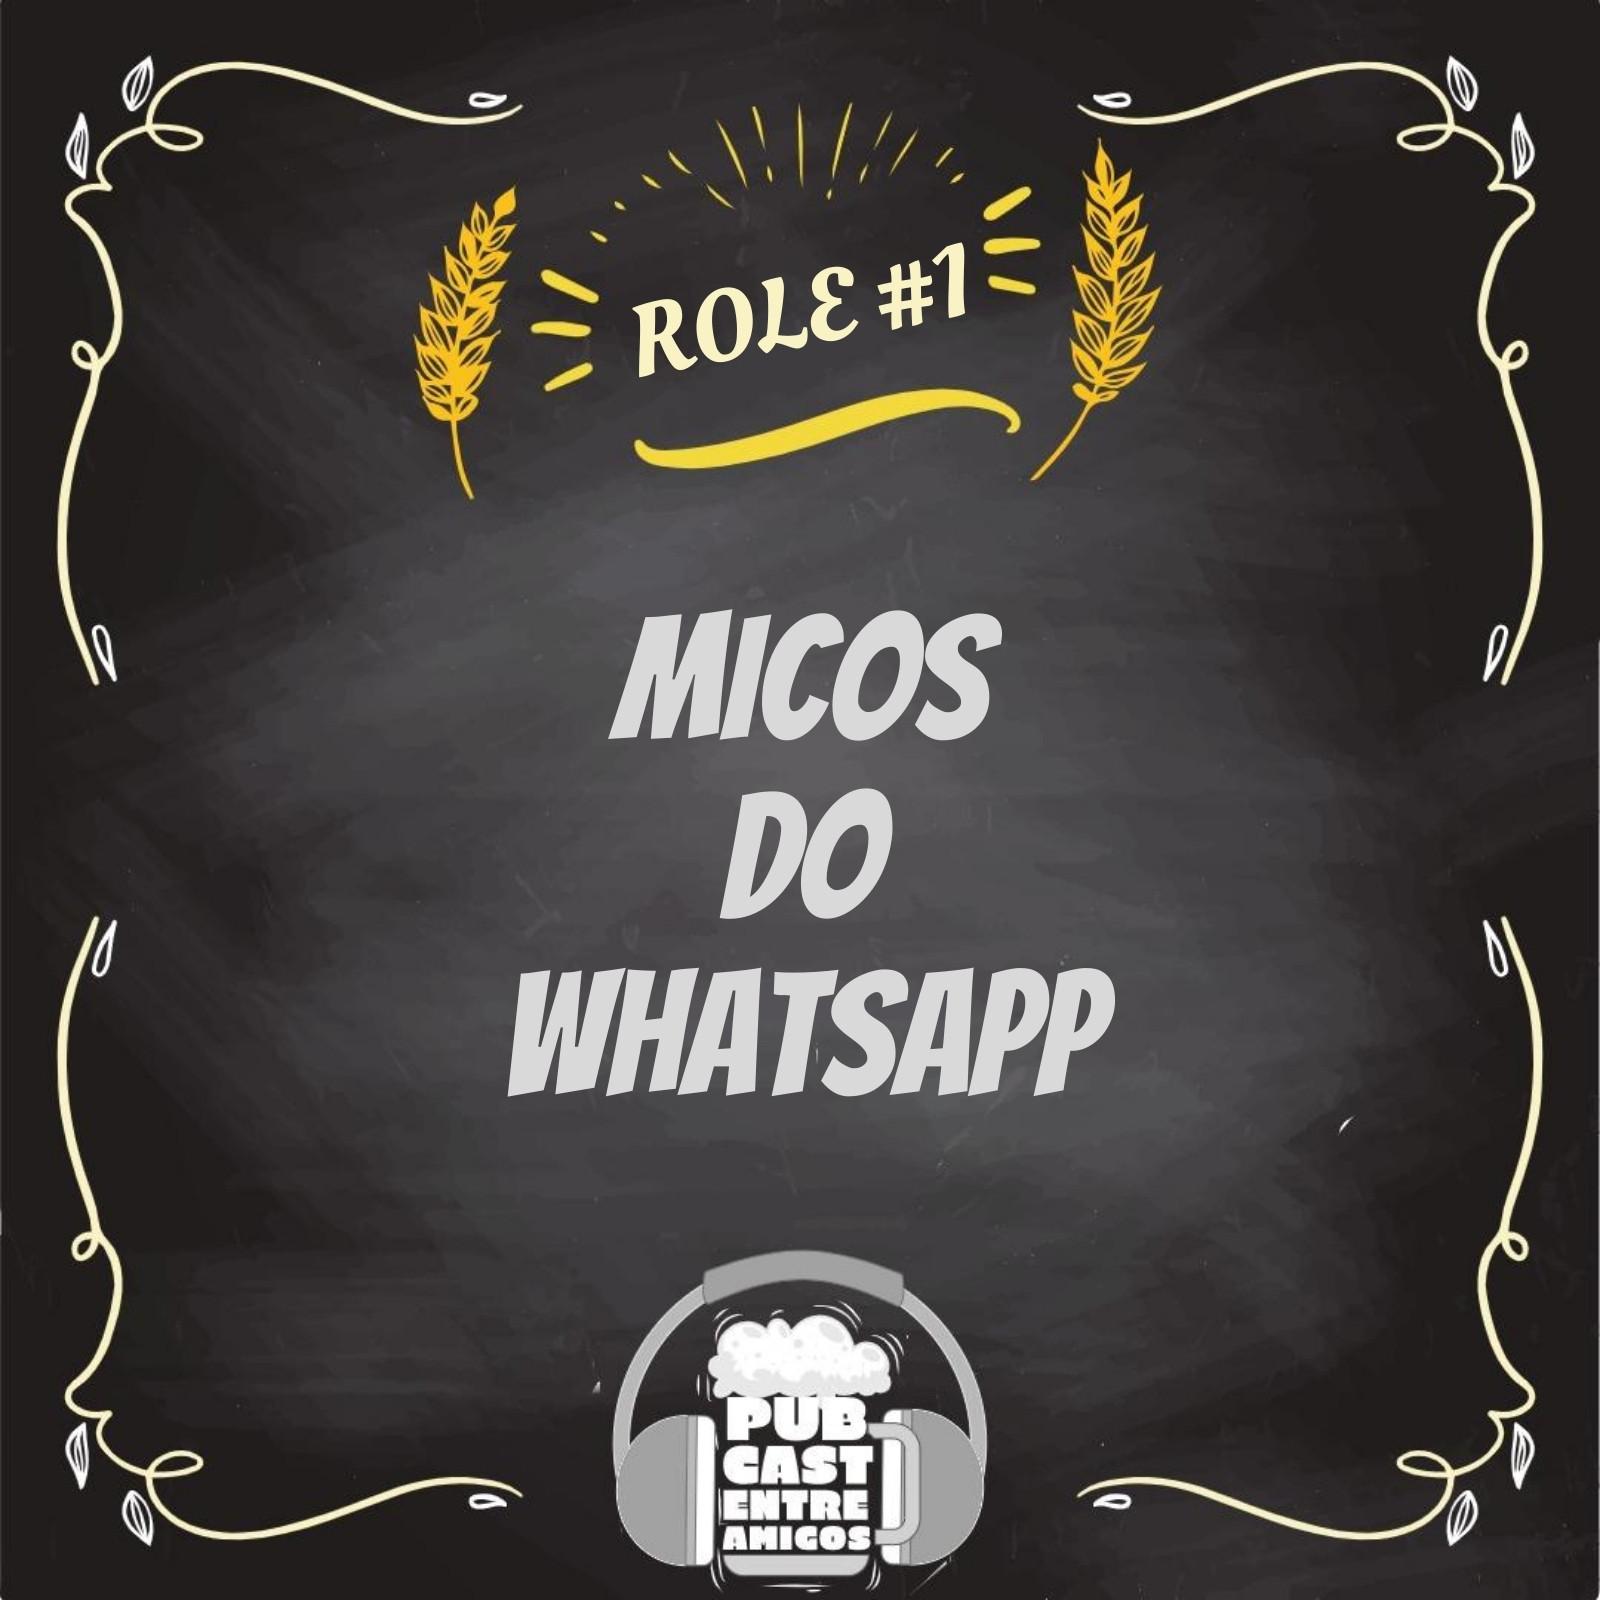 PubCast Rolê#1 - Micos do Whatsapp